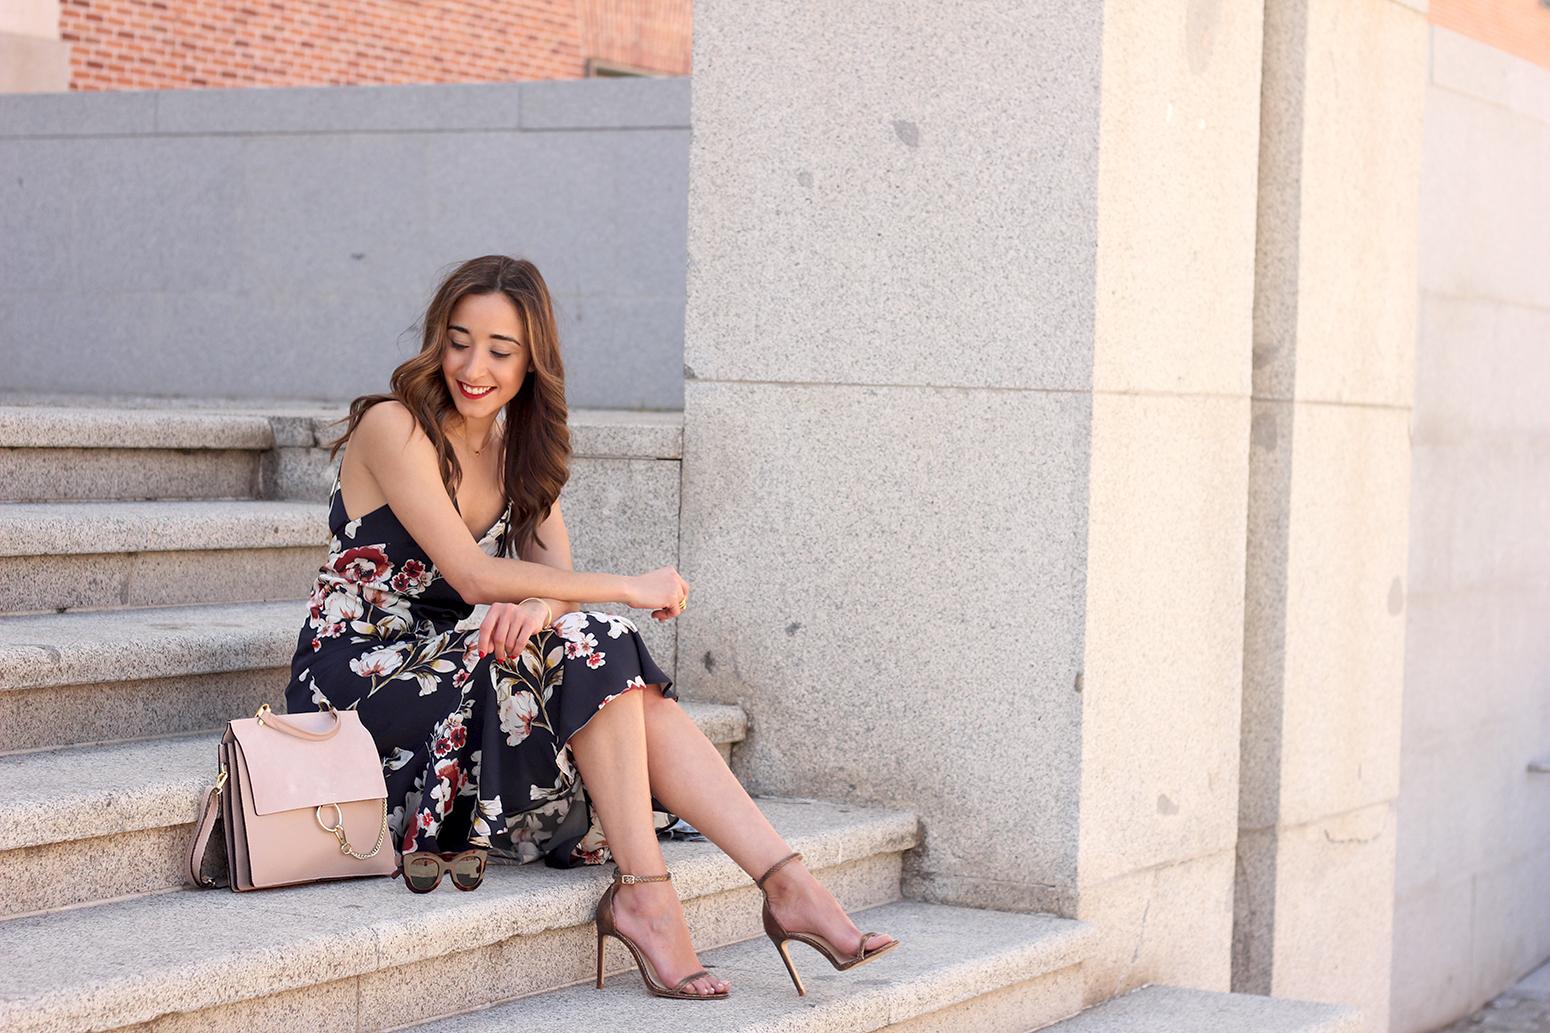 Floral dress denim jacket heels spring outfit style fashion15